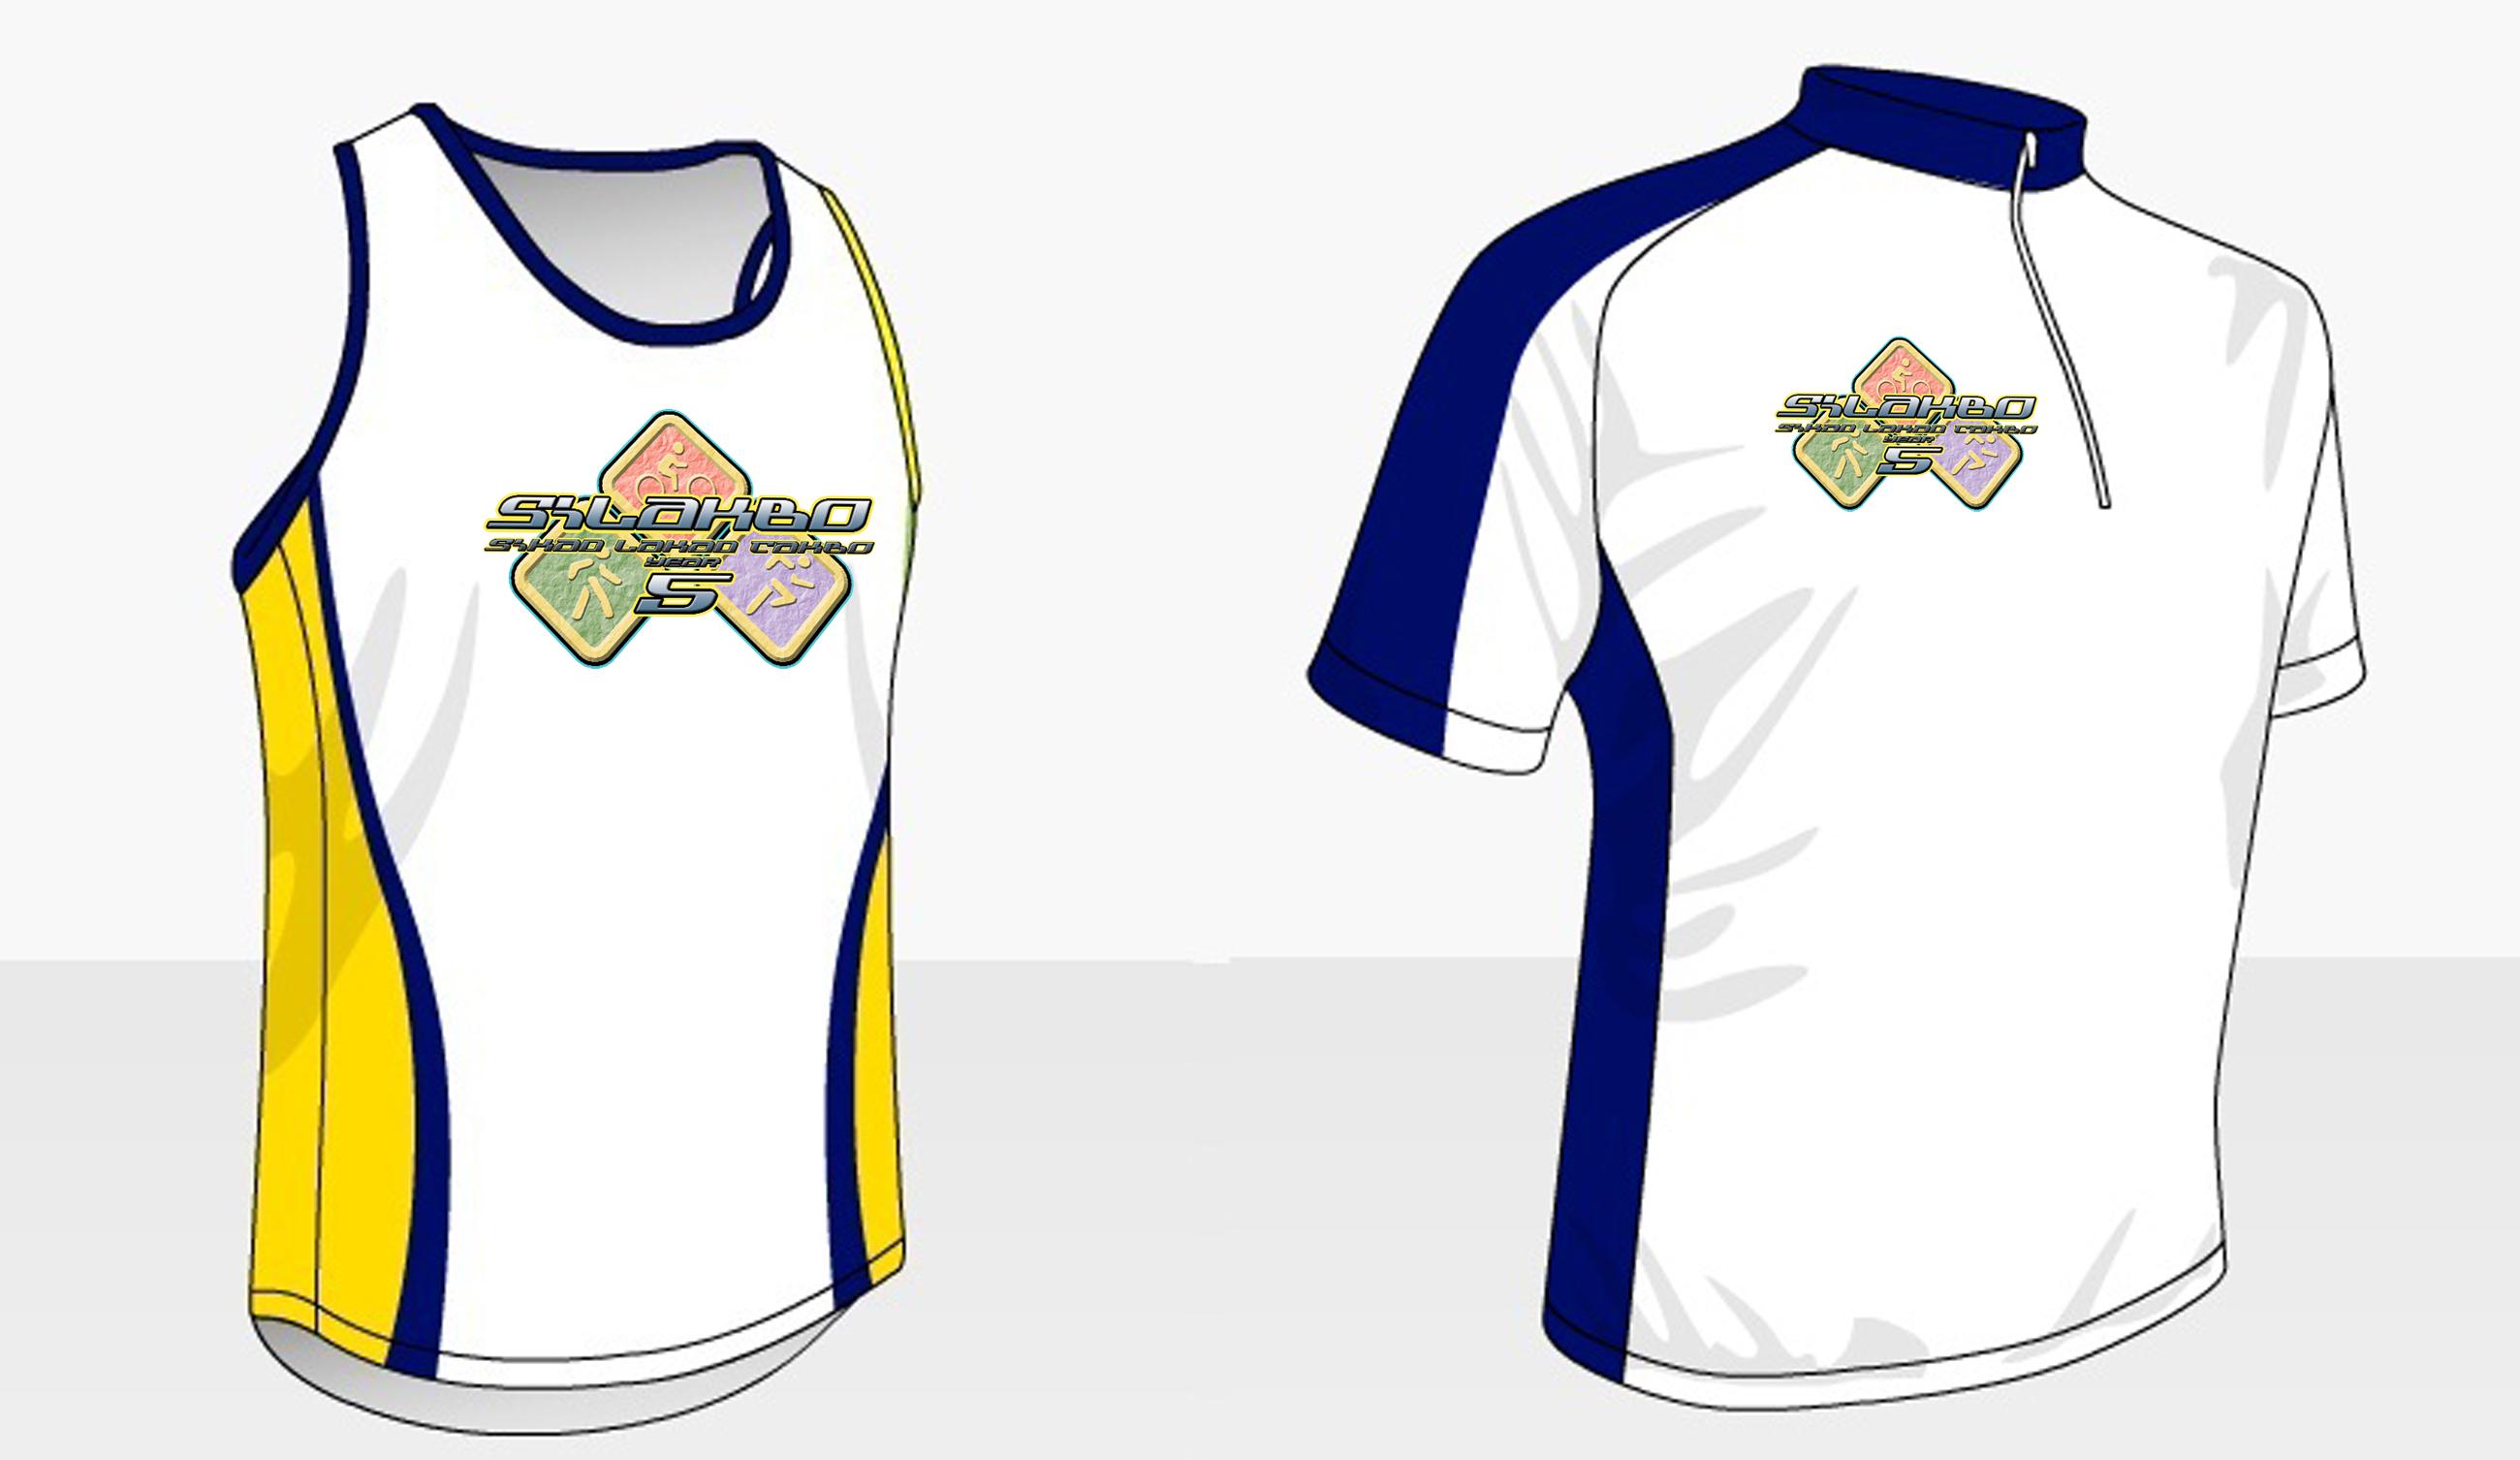 silakbo-half-marathon-2013-singlet-and-jersey-design